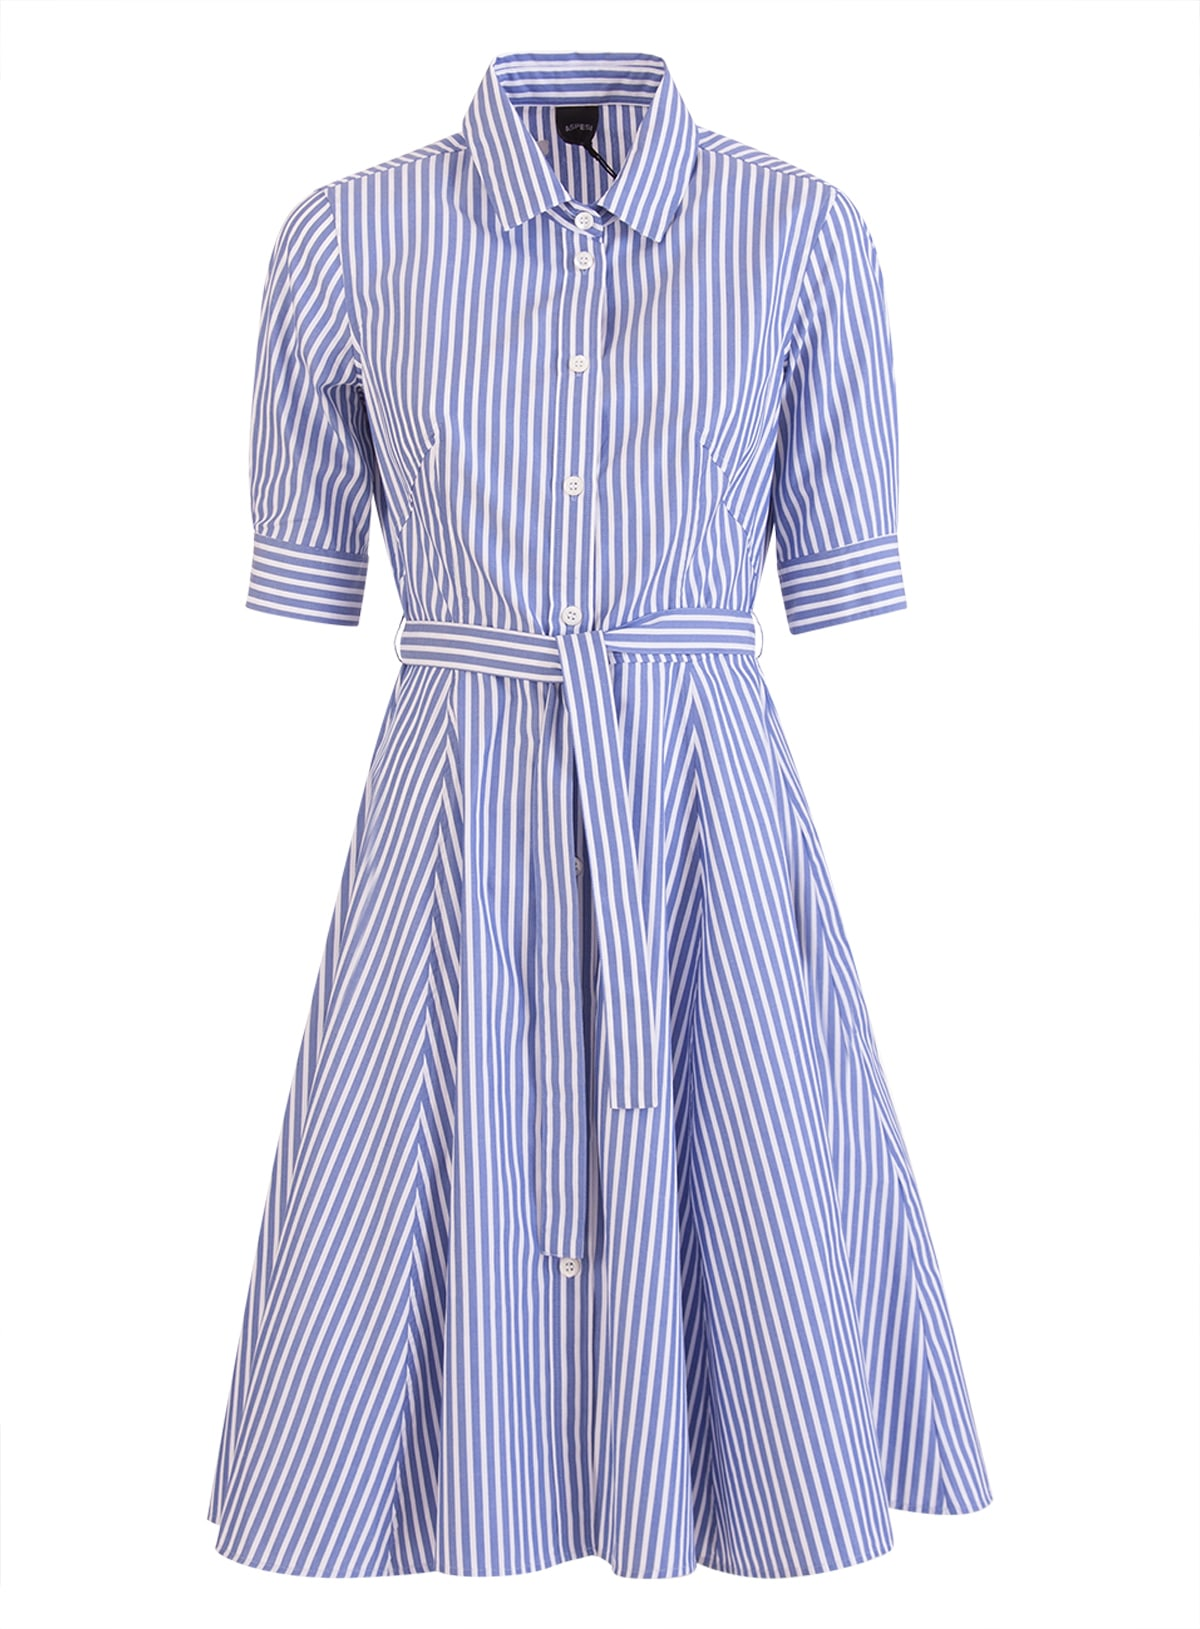 Buy Aspesi Striped Shirt Dress online, shop Aspesi with free shipping